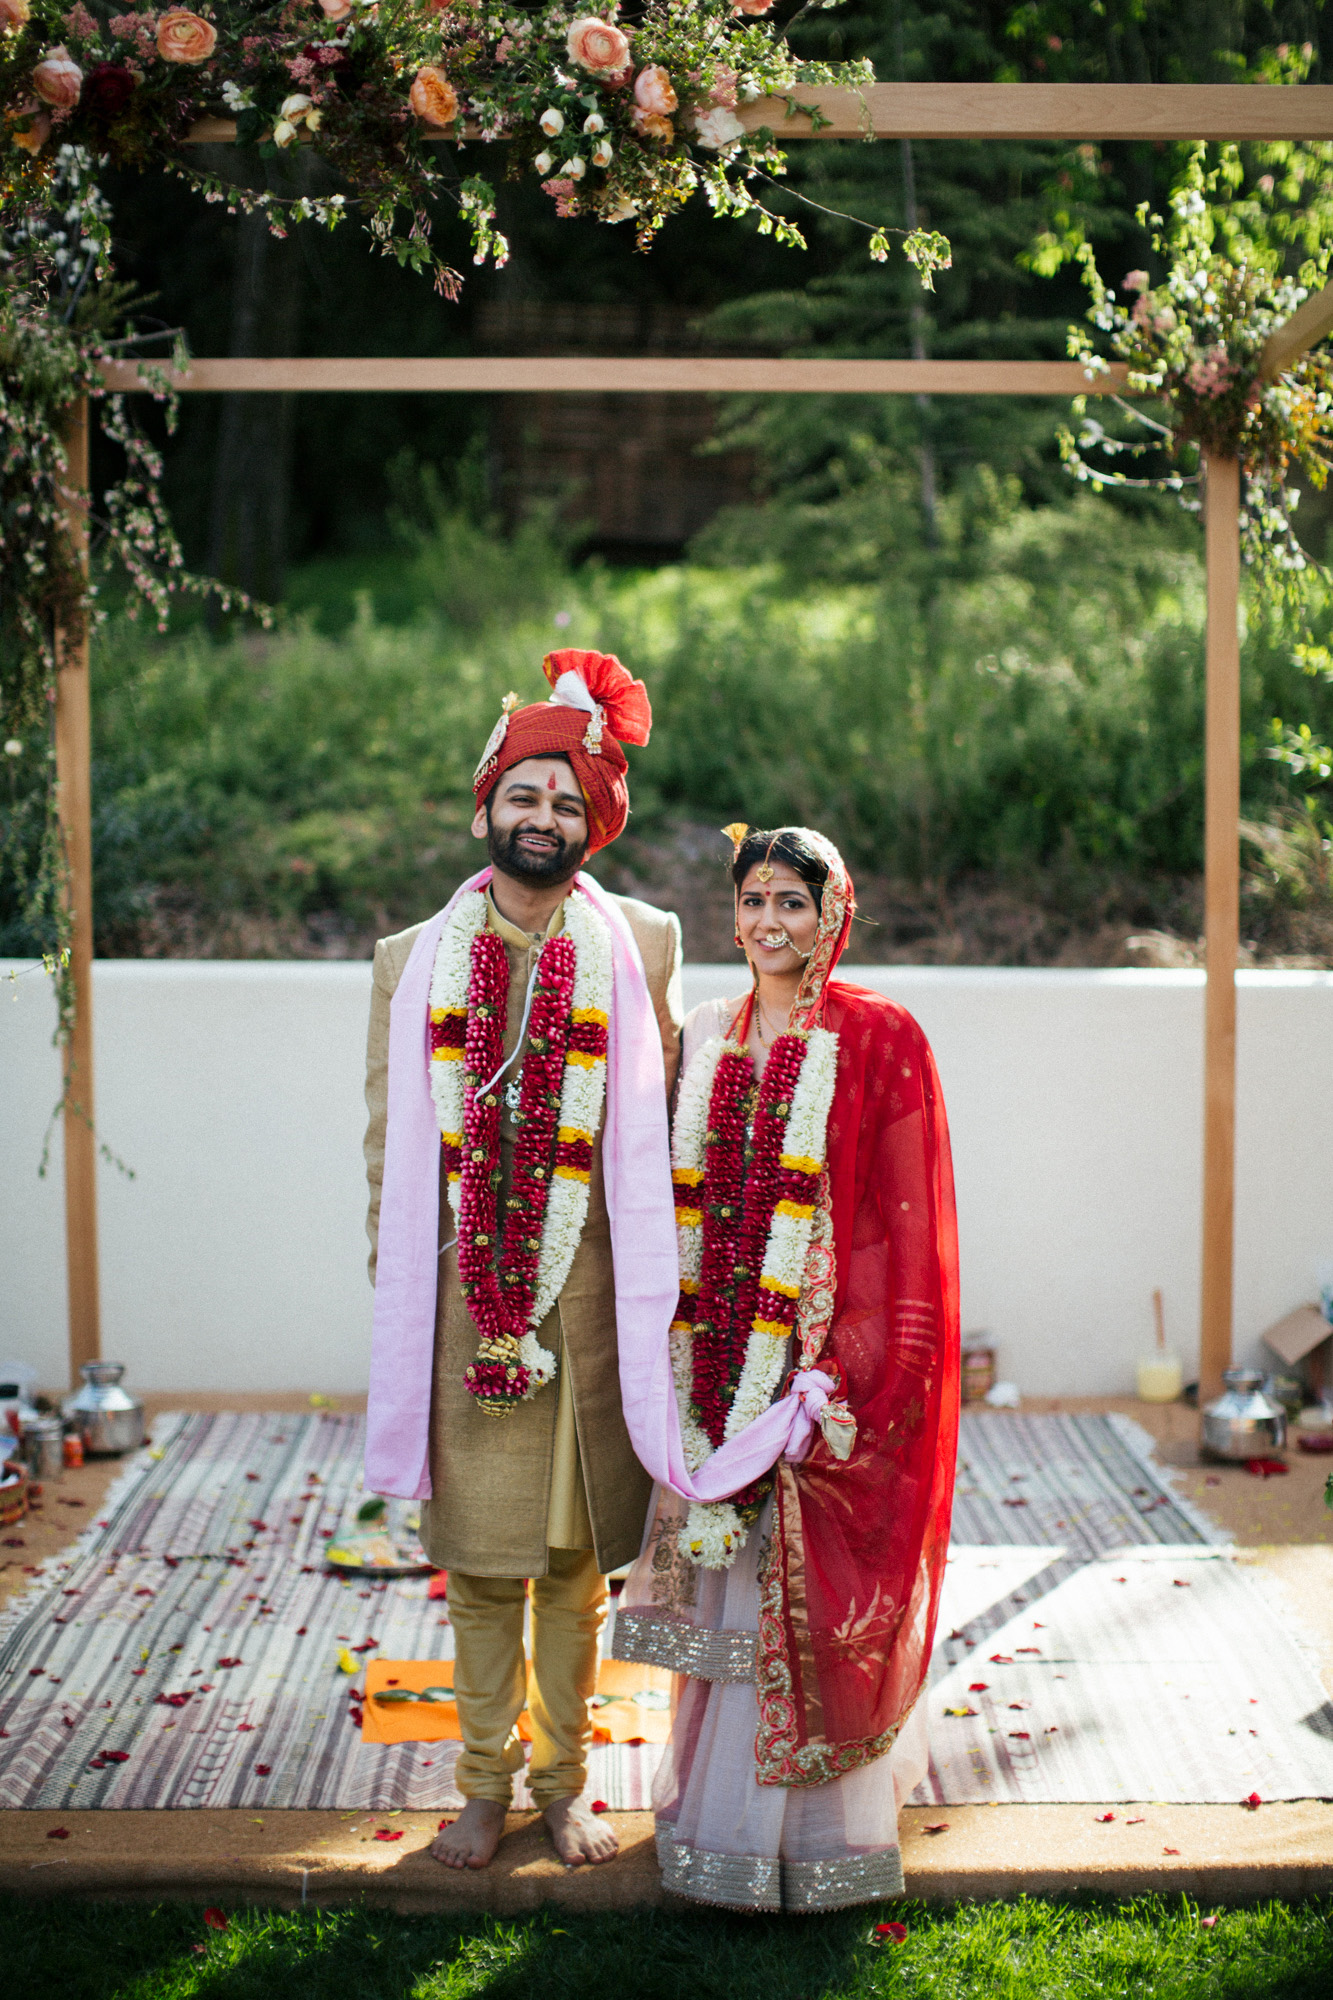 anu_maneesh_alec_vanderboom_Indian_wedding_photography-0115.jpg